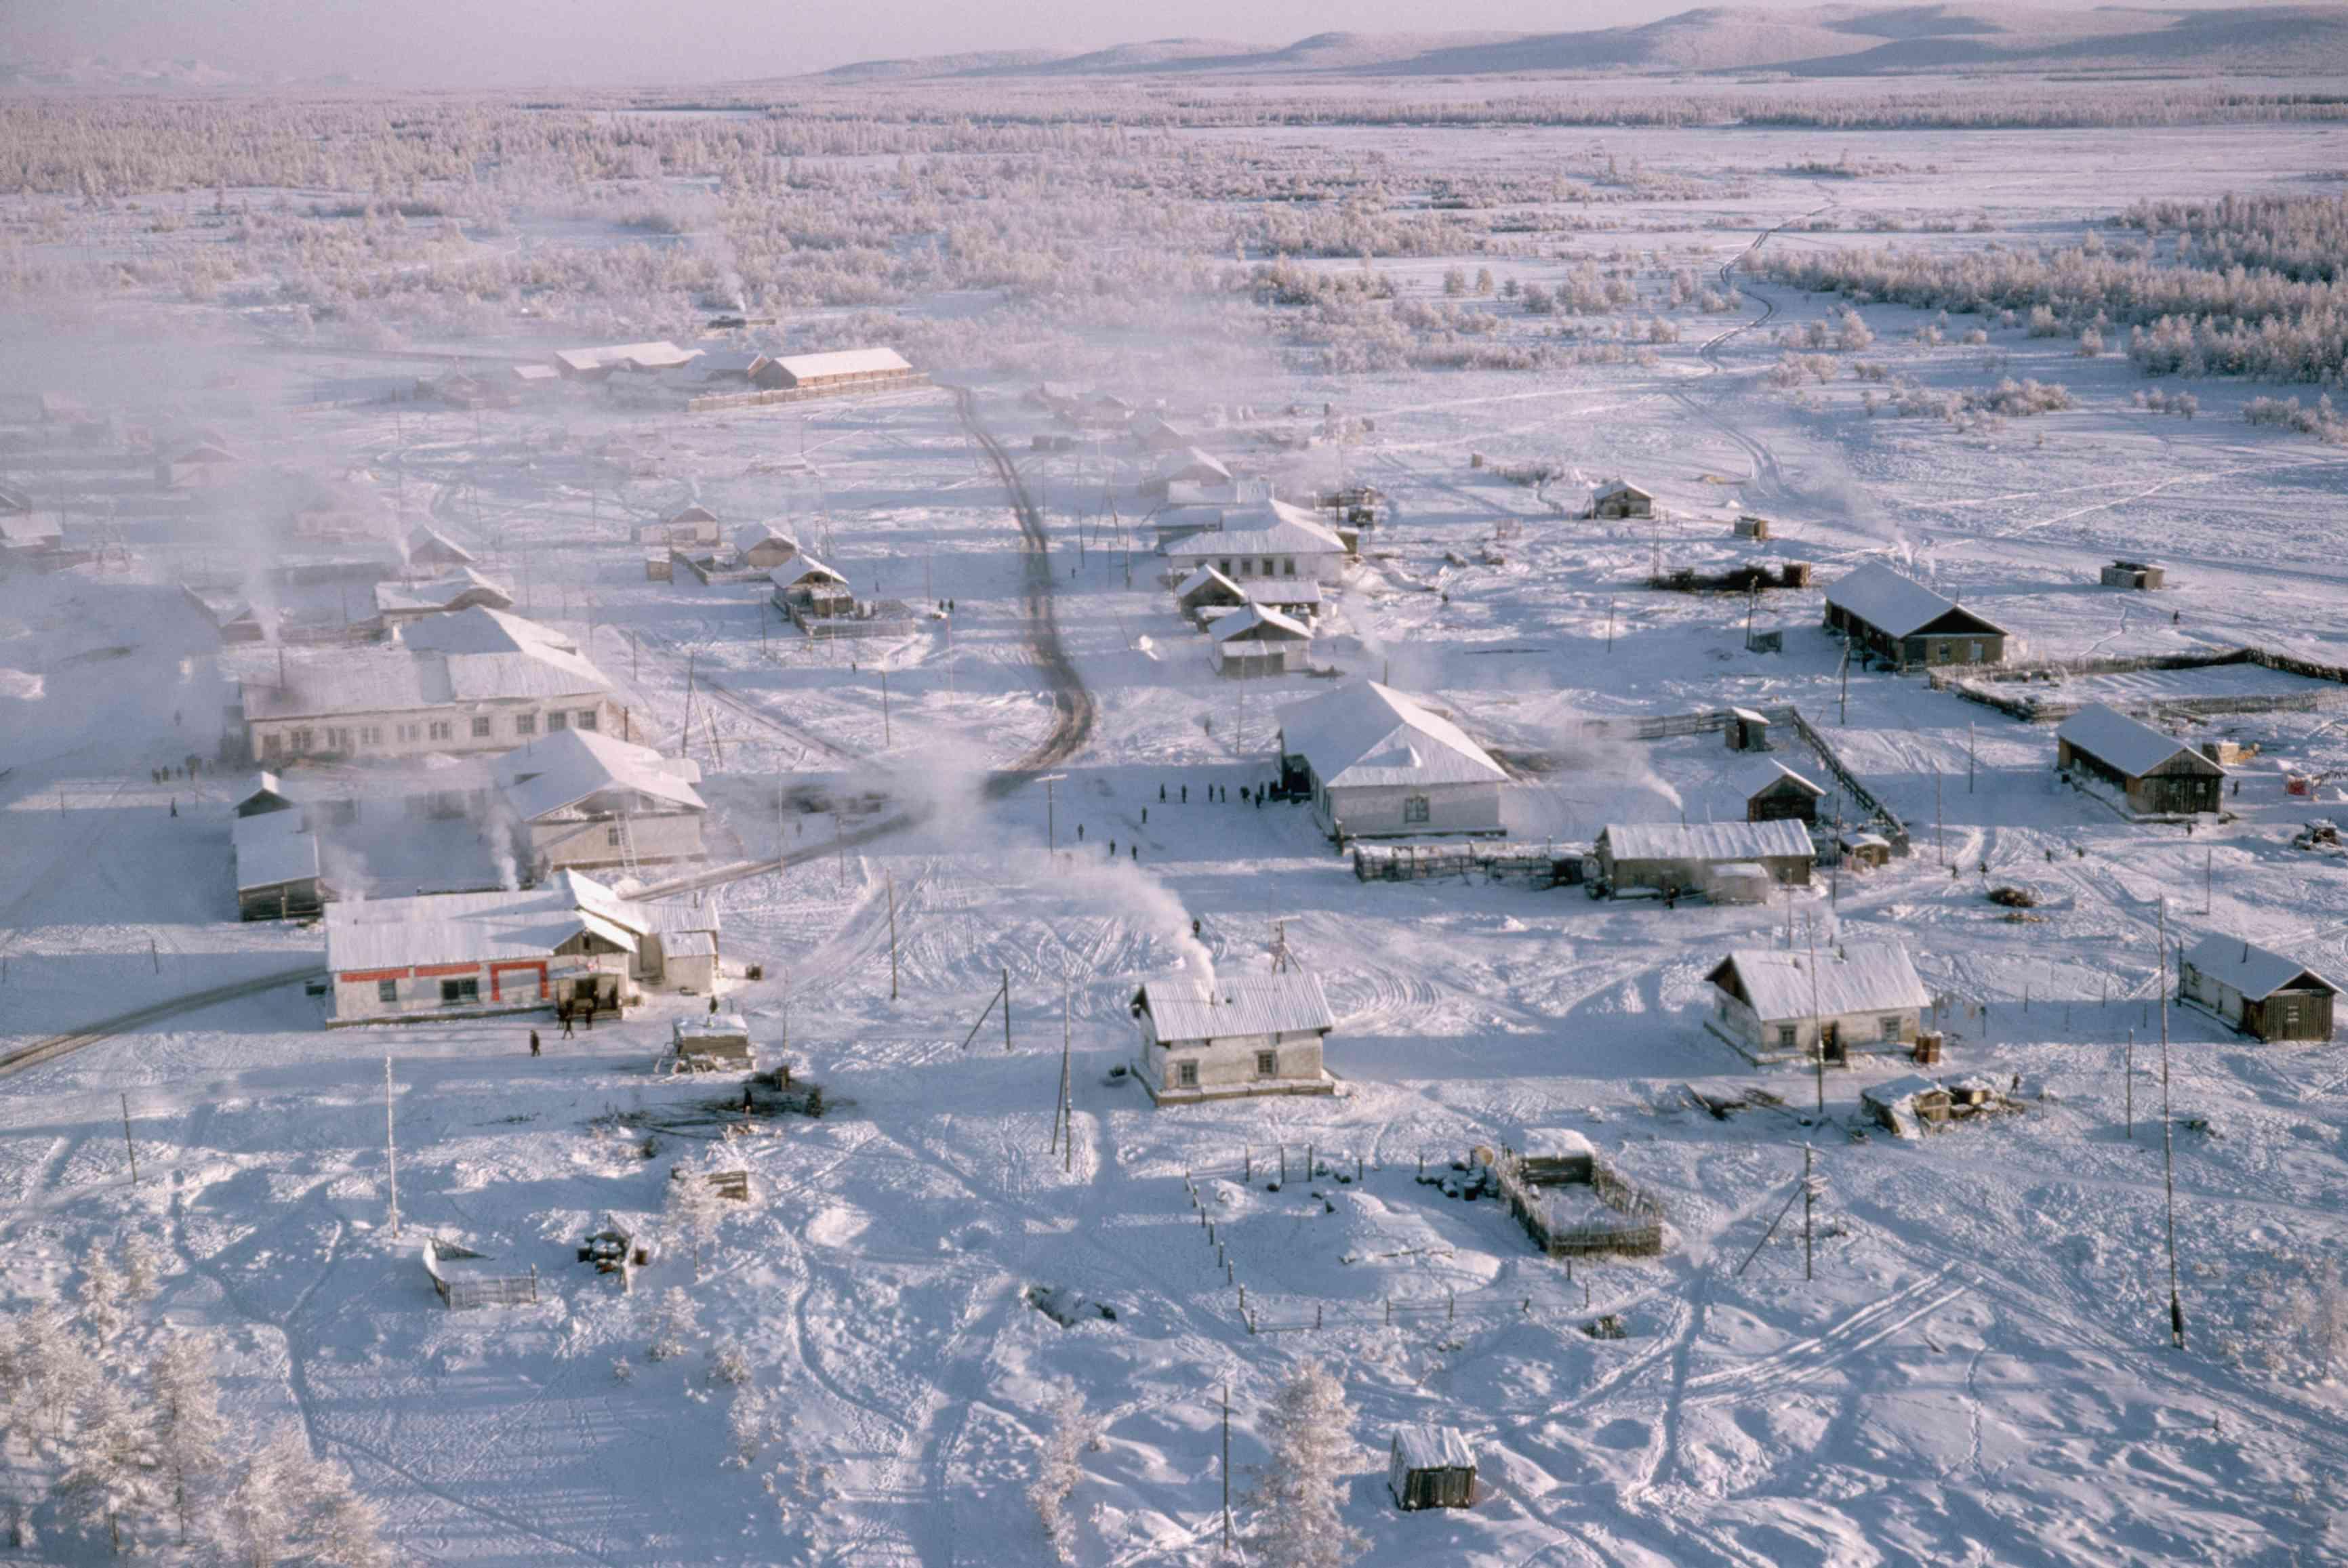 Aerial view of Oymyakon Town, Siberia, Russia